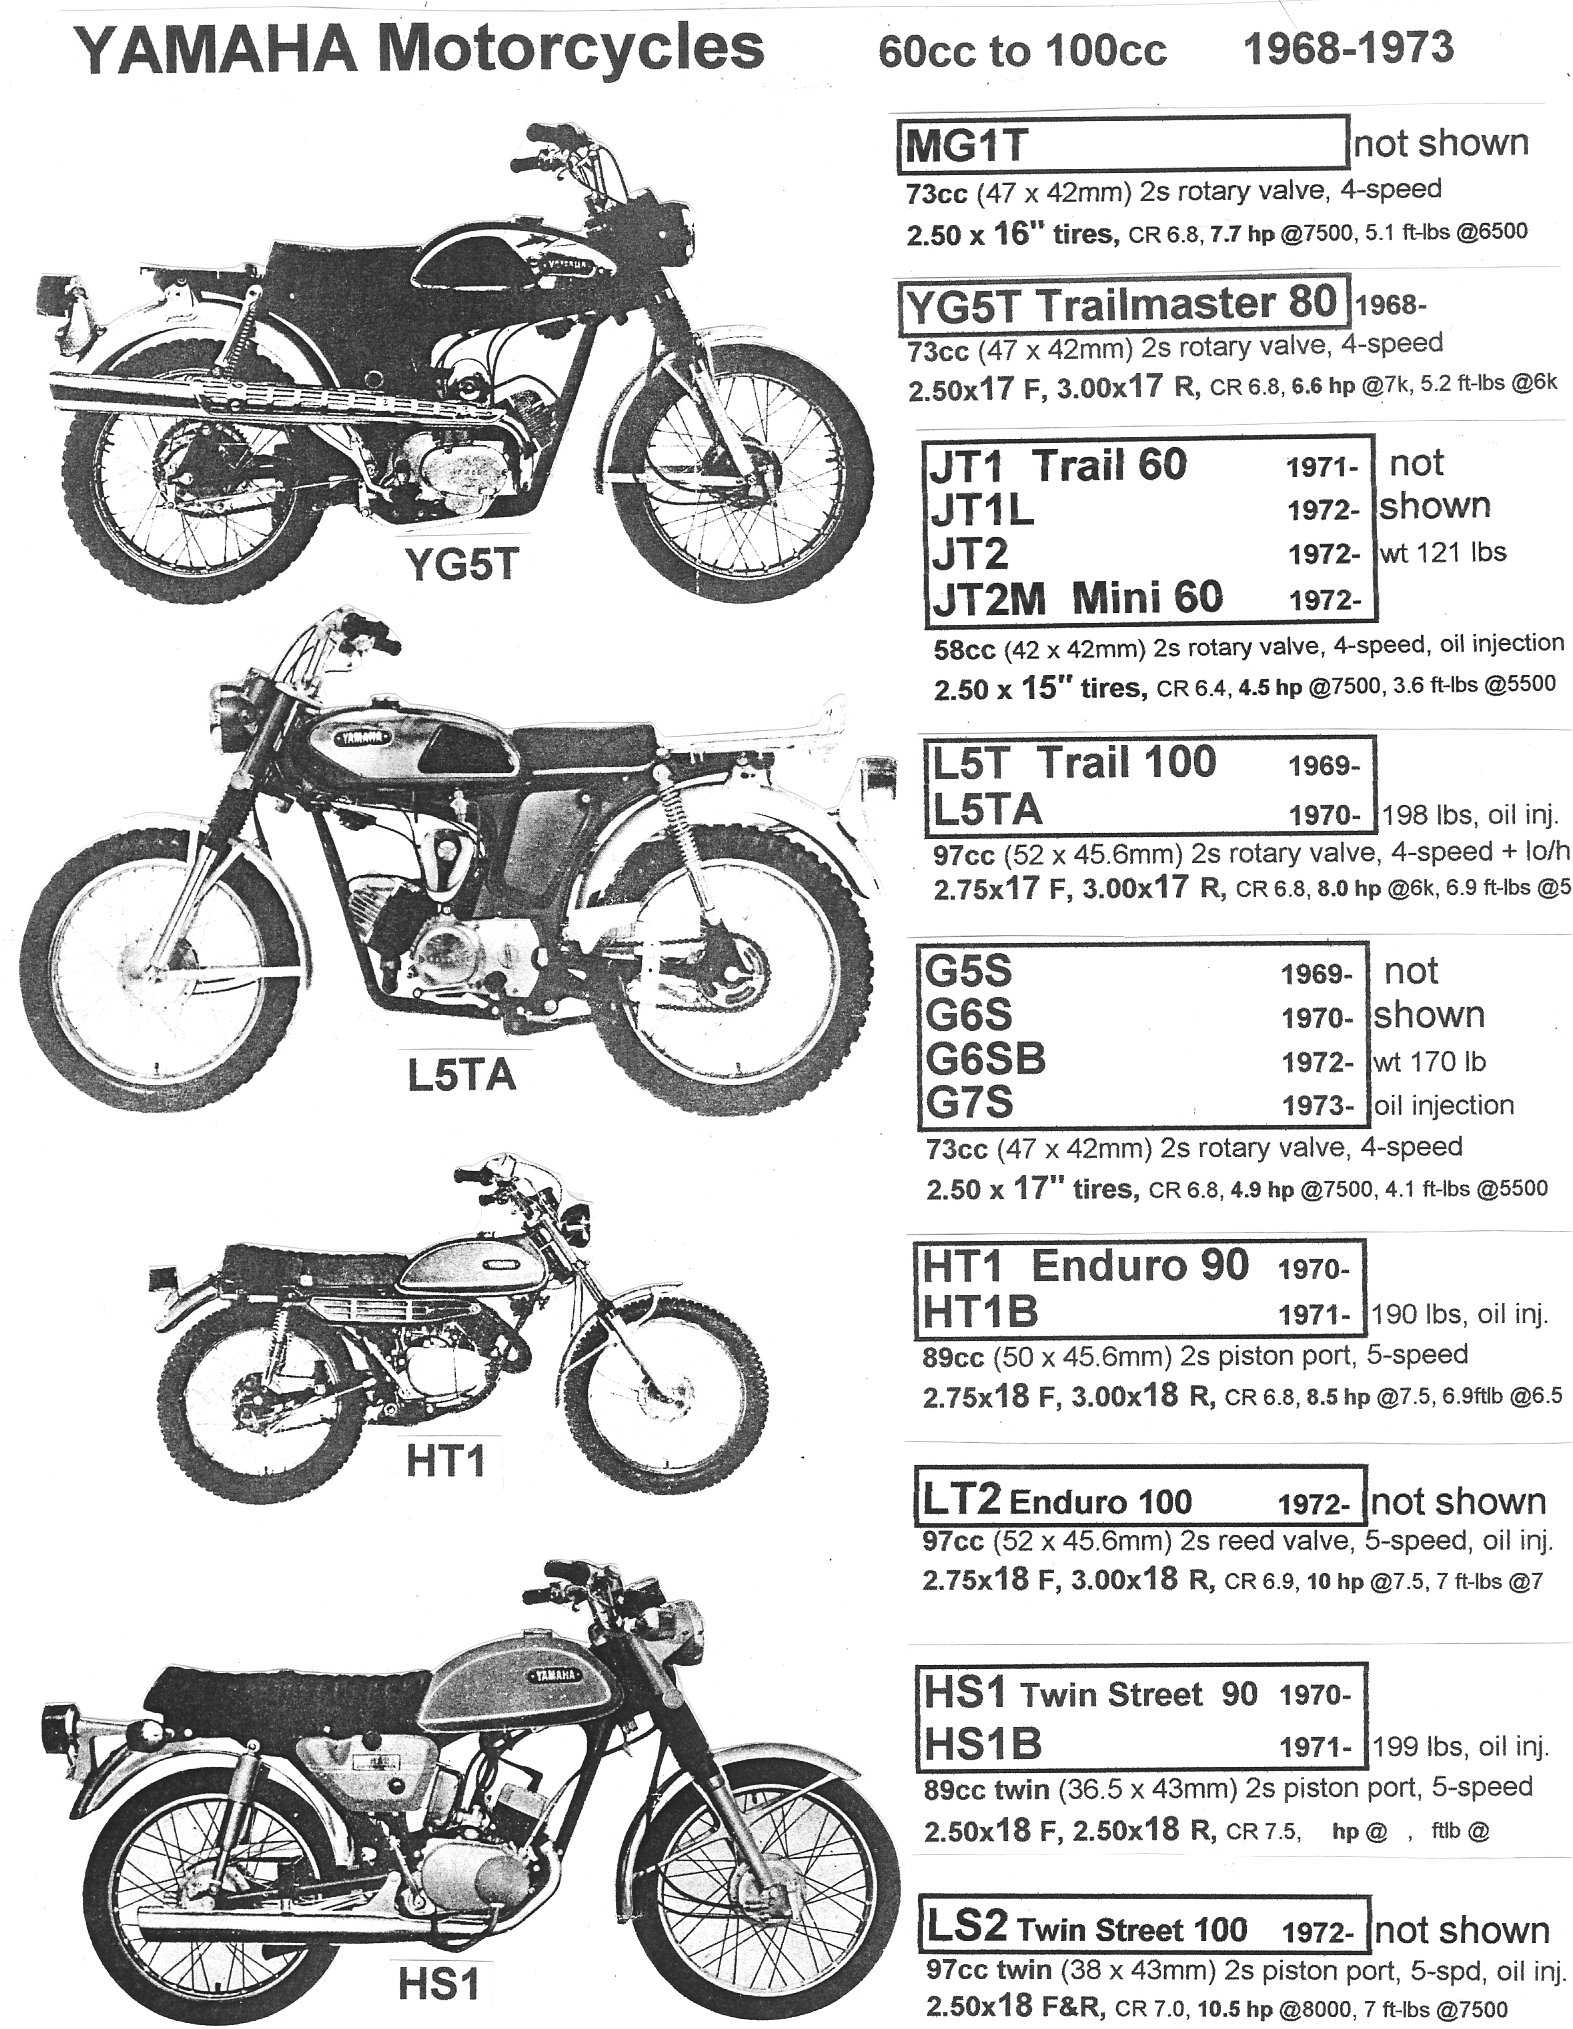 Yamaha Yj2 Riverside 60cc 2 Stroke Single W 4spd